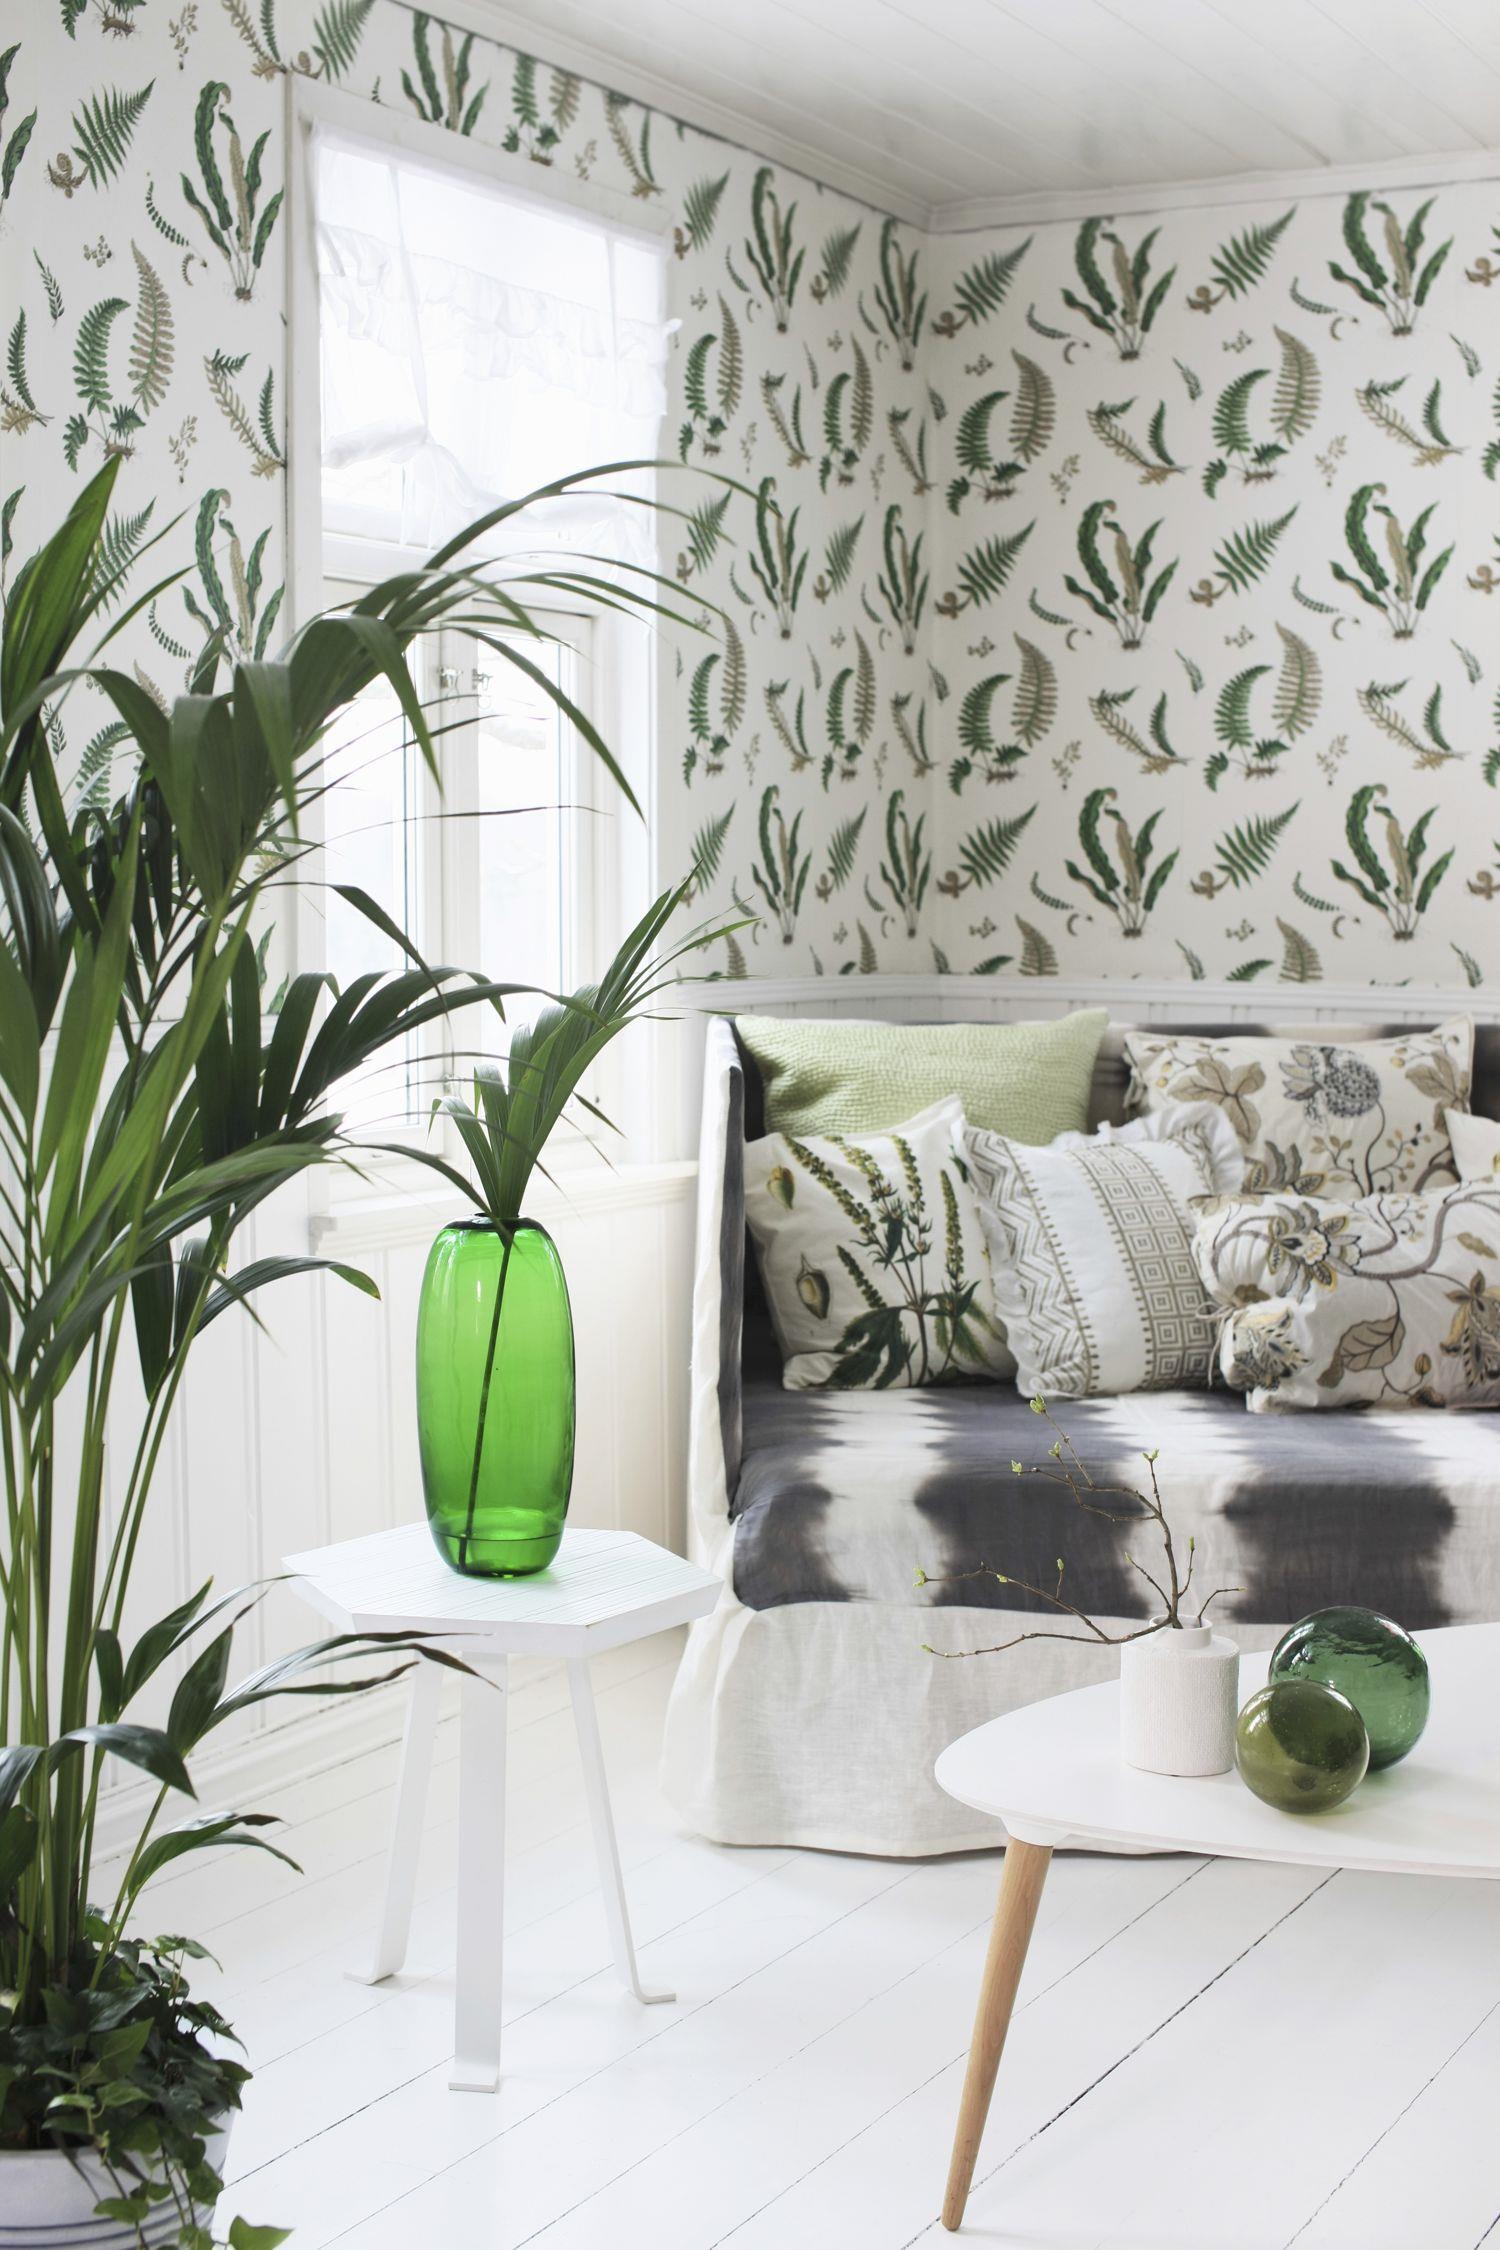 Dalani, Caraibi, Casa, Cocktail, Colori, Design, Idee, Natura, Style